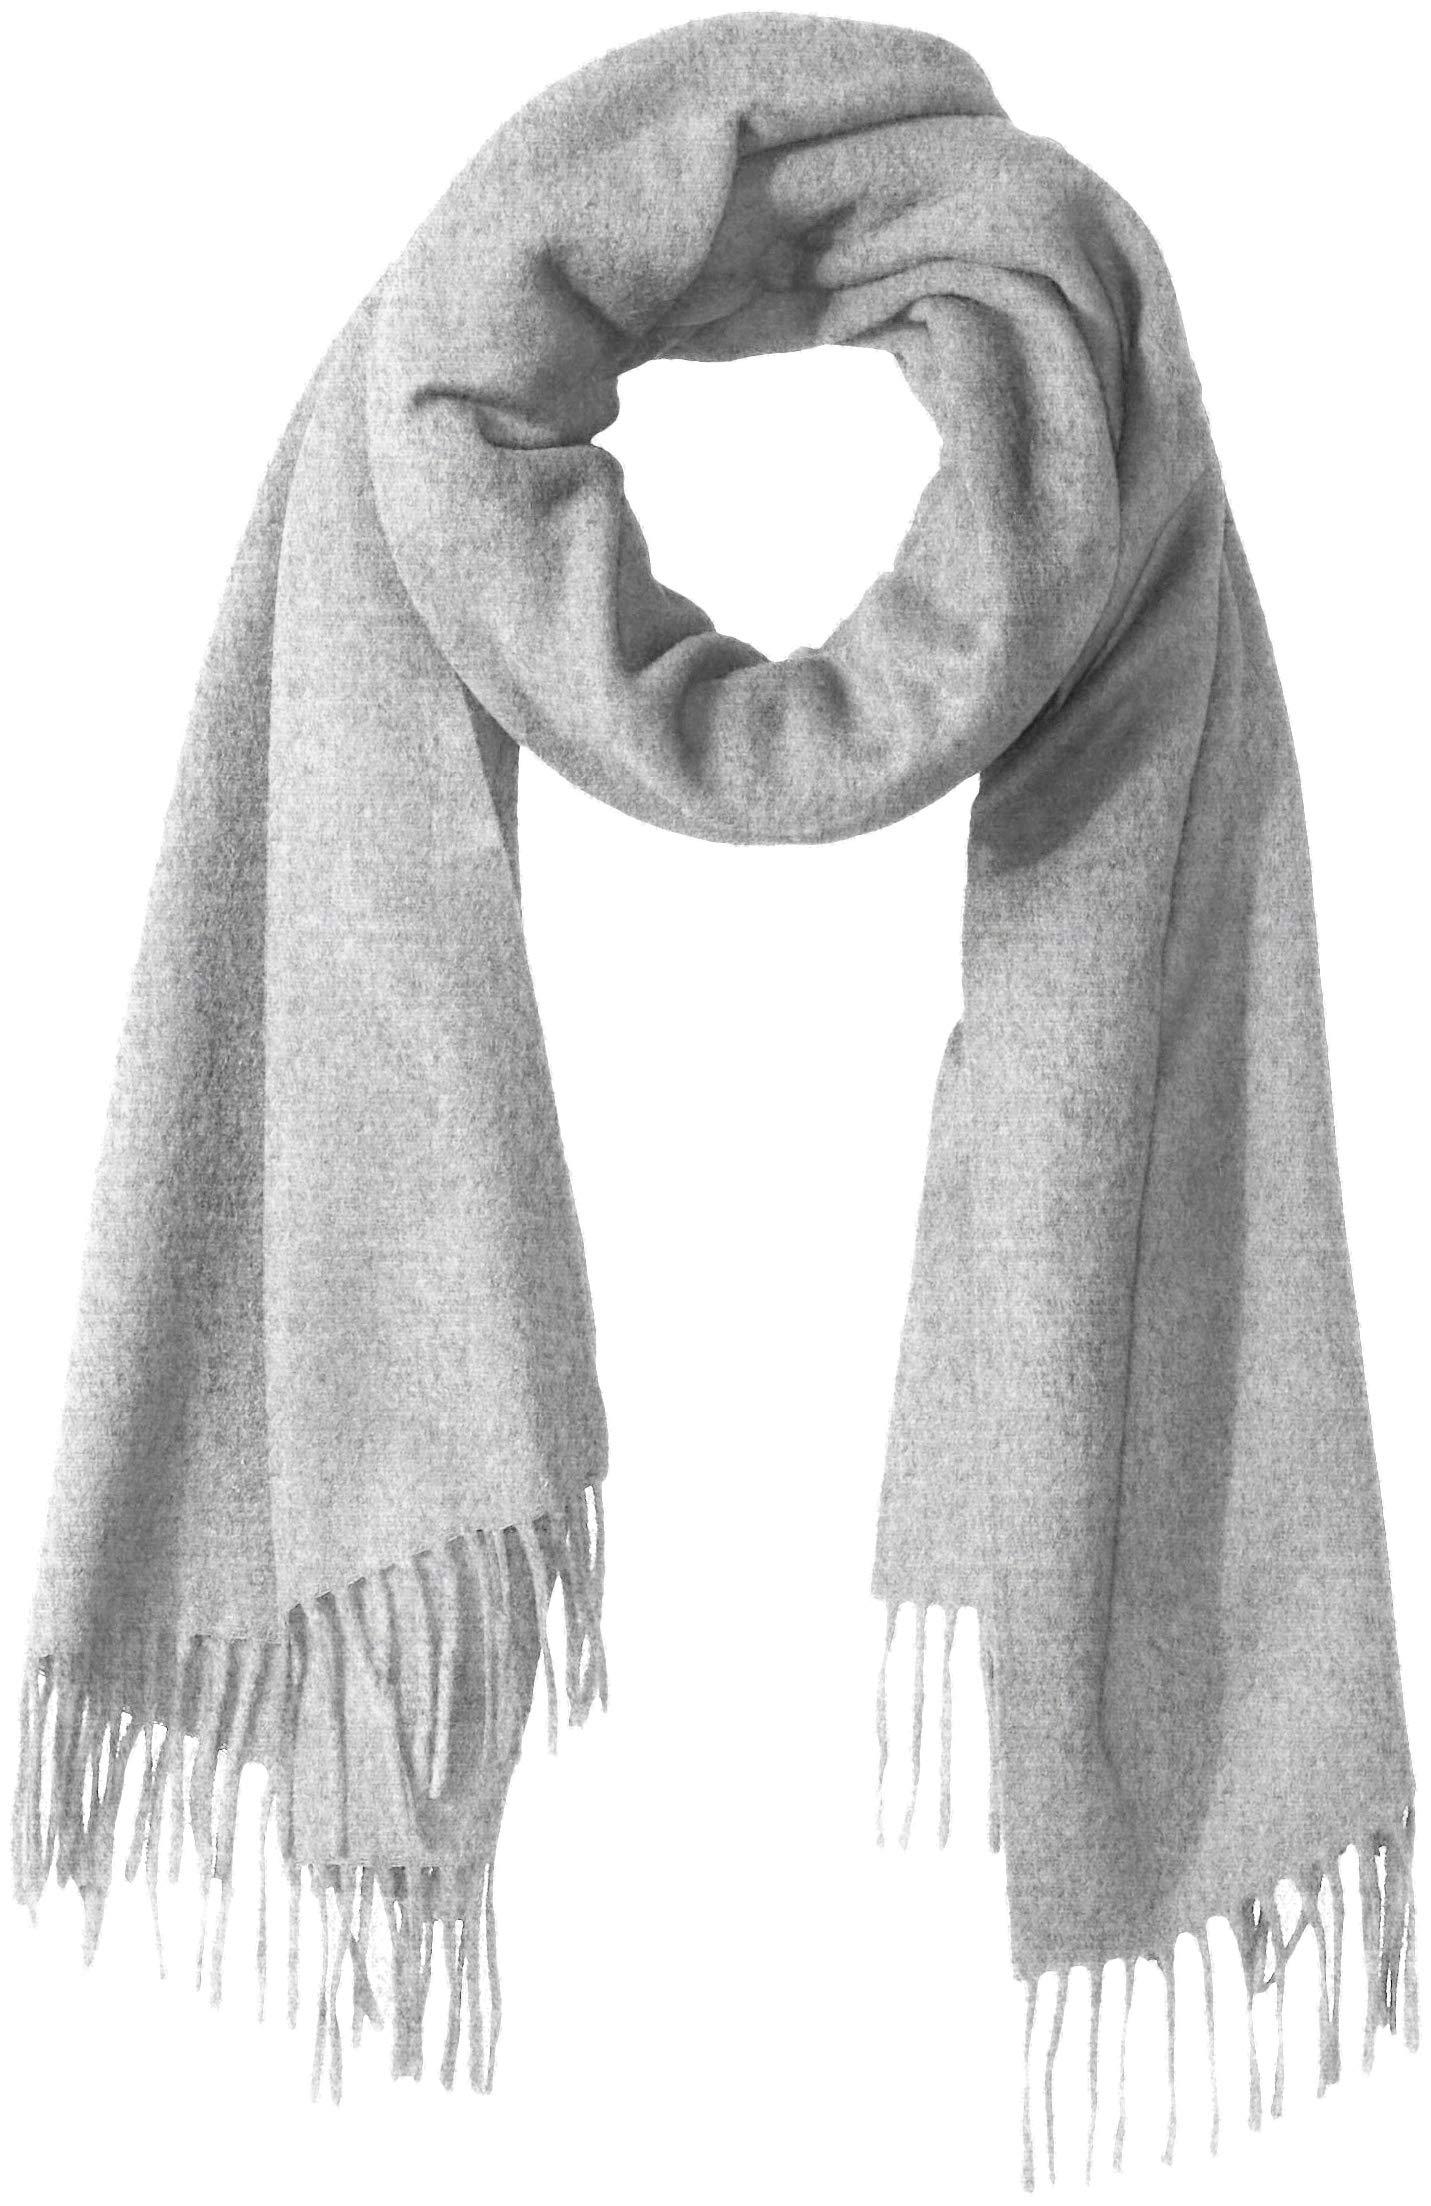 J.Lindeberg Men's Classic Wool Scarf, stone grey melange, One Size